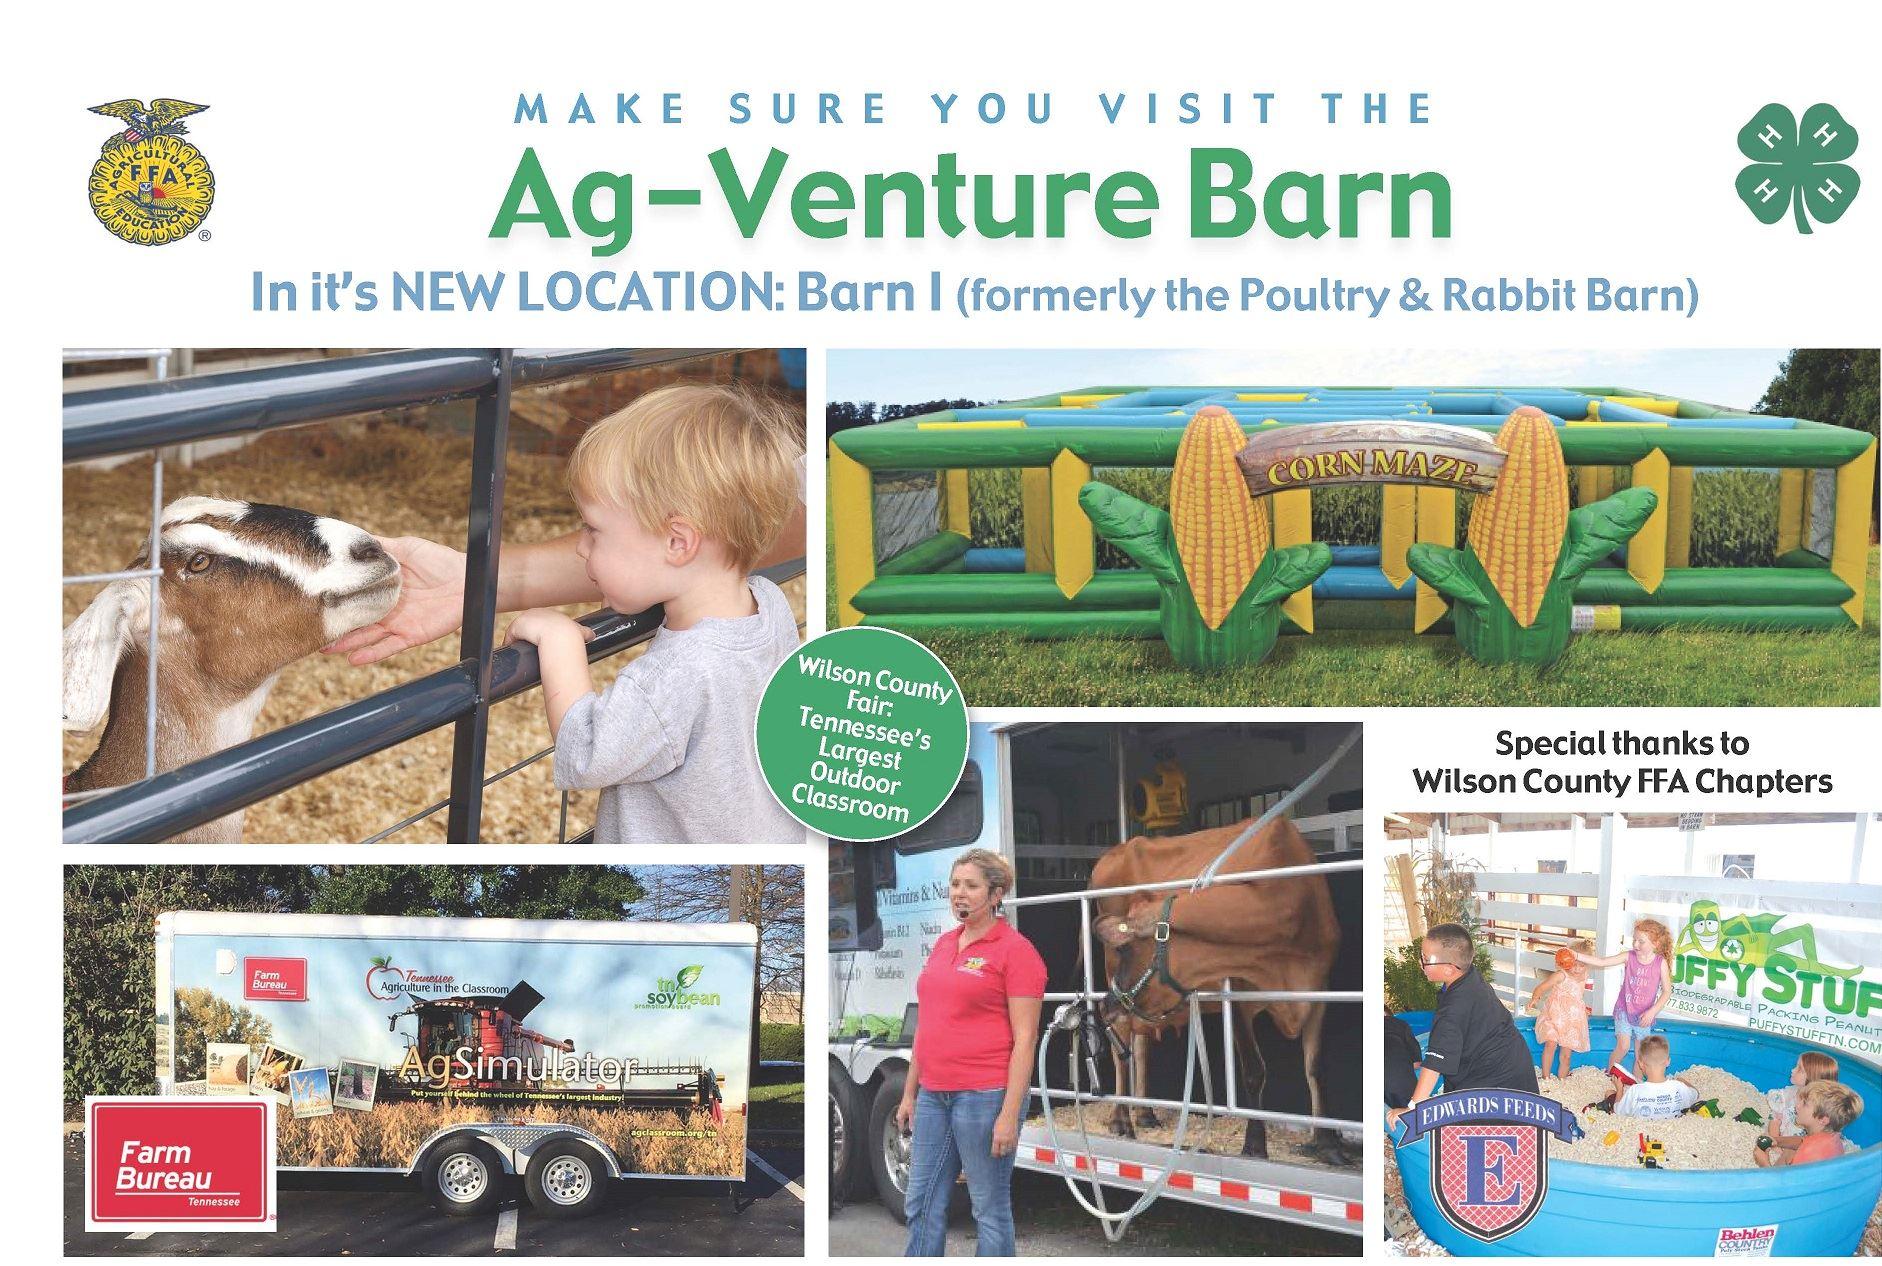 Agventure Barn